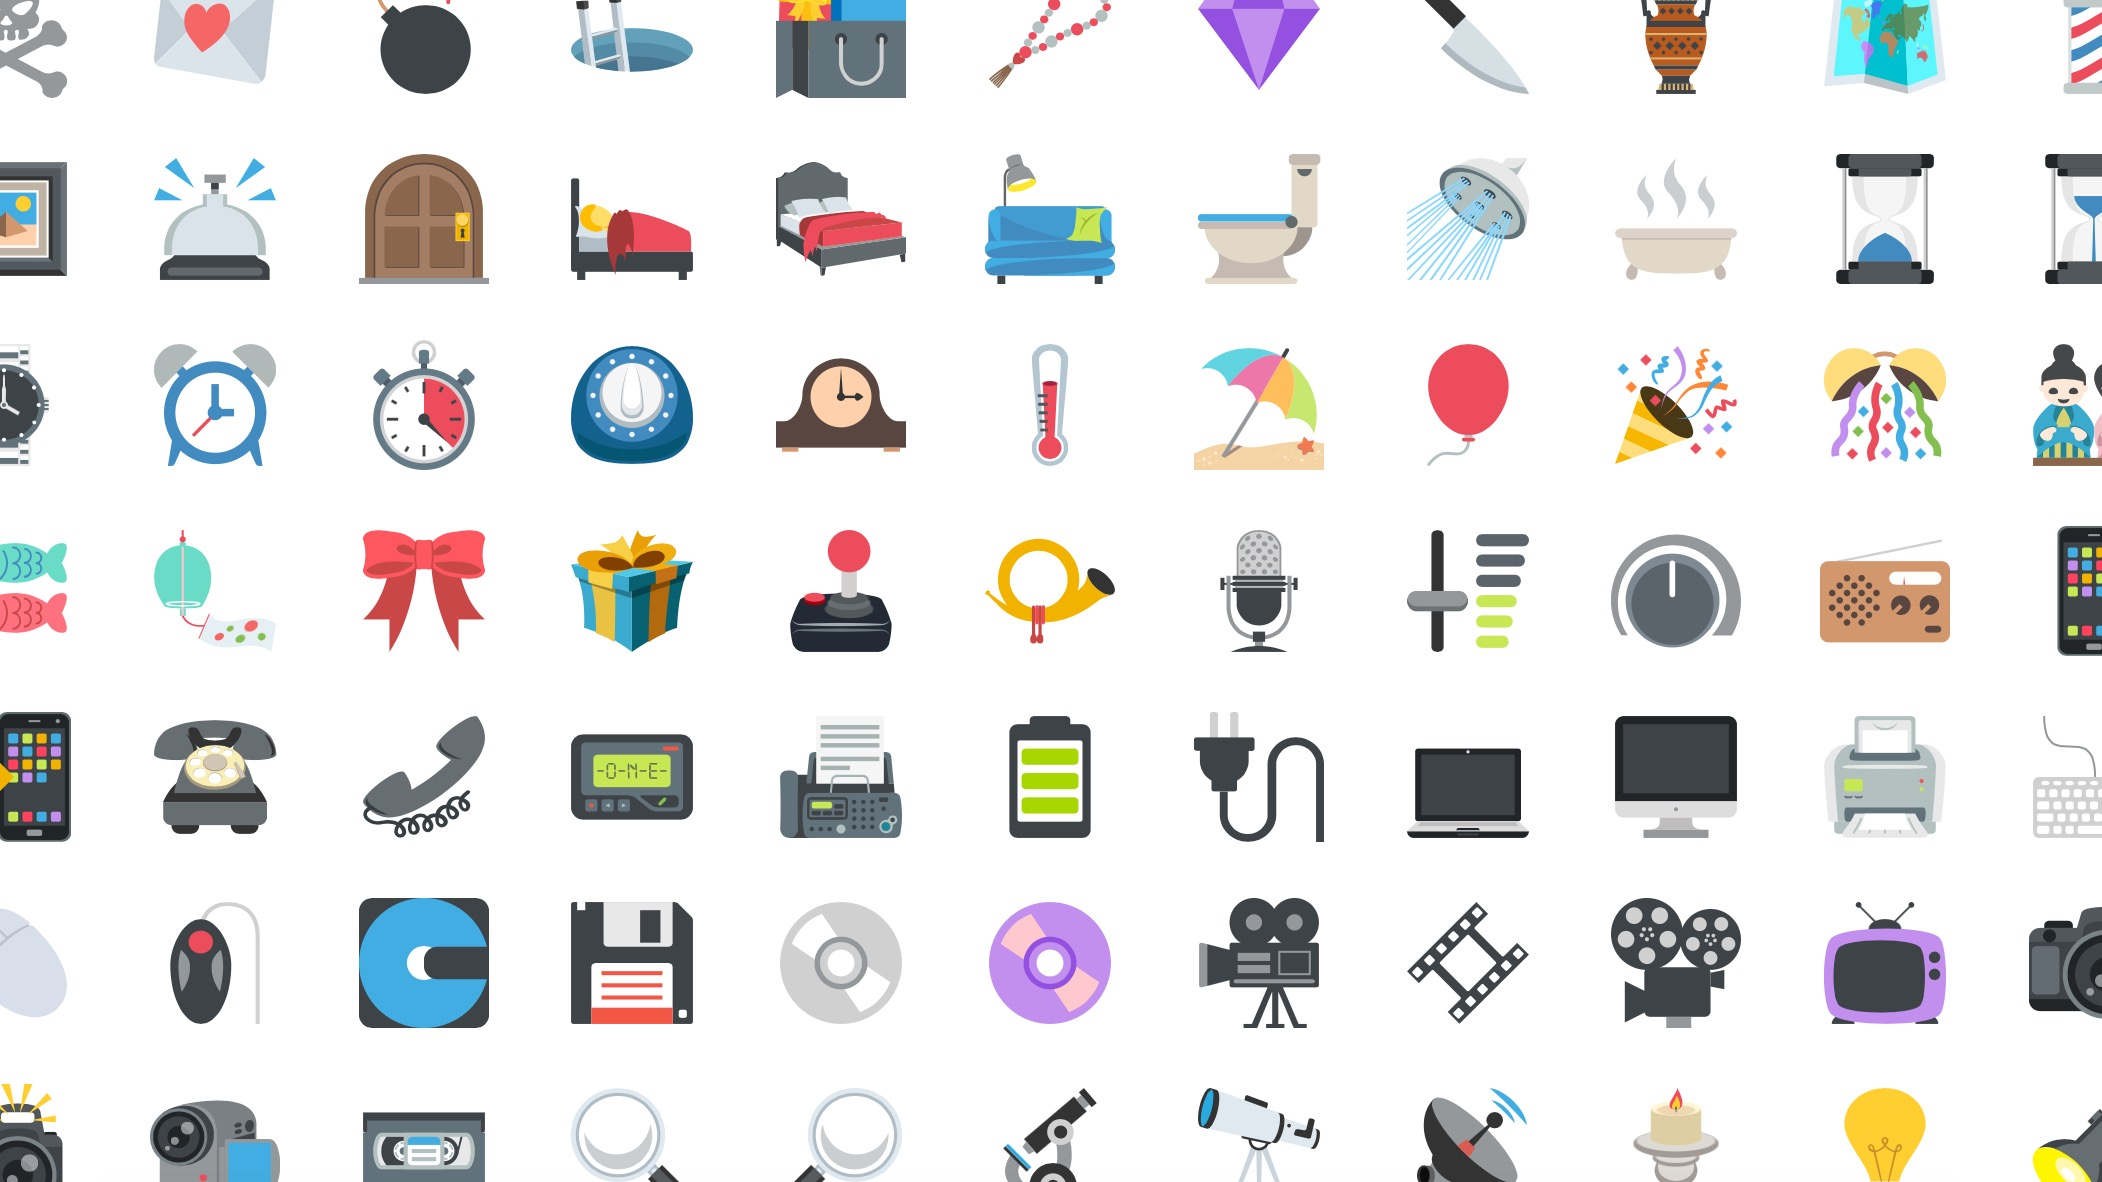 Using Emojis to develop vocabulary and source analysis skills